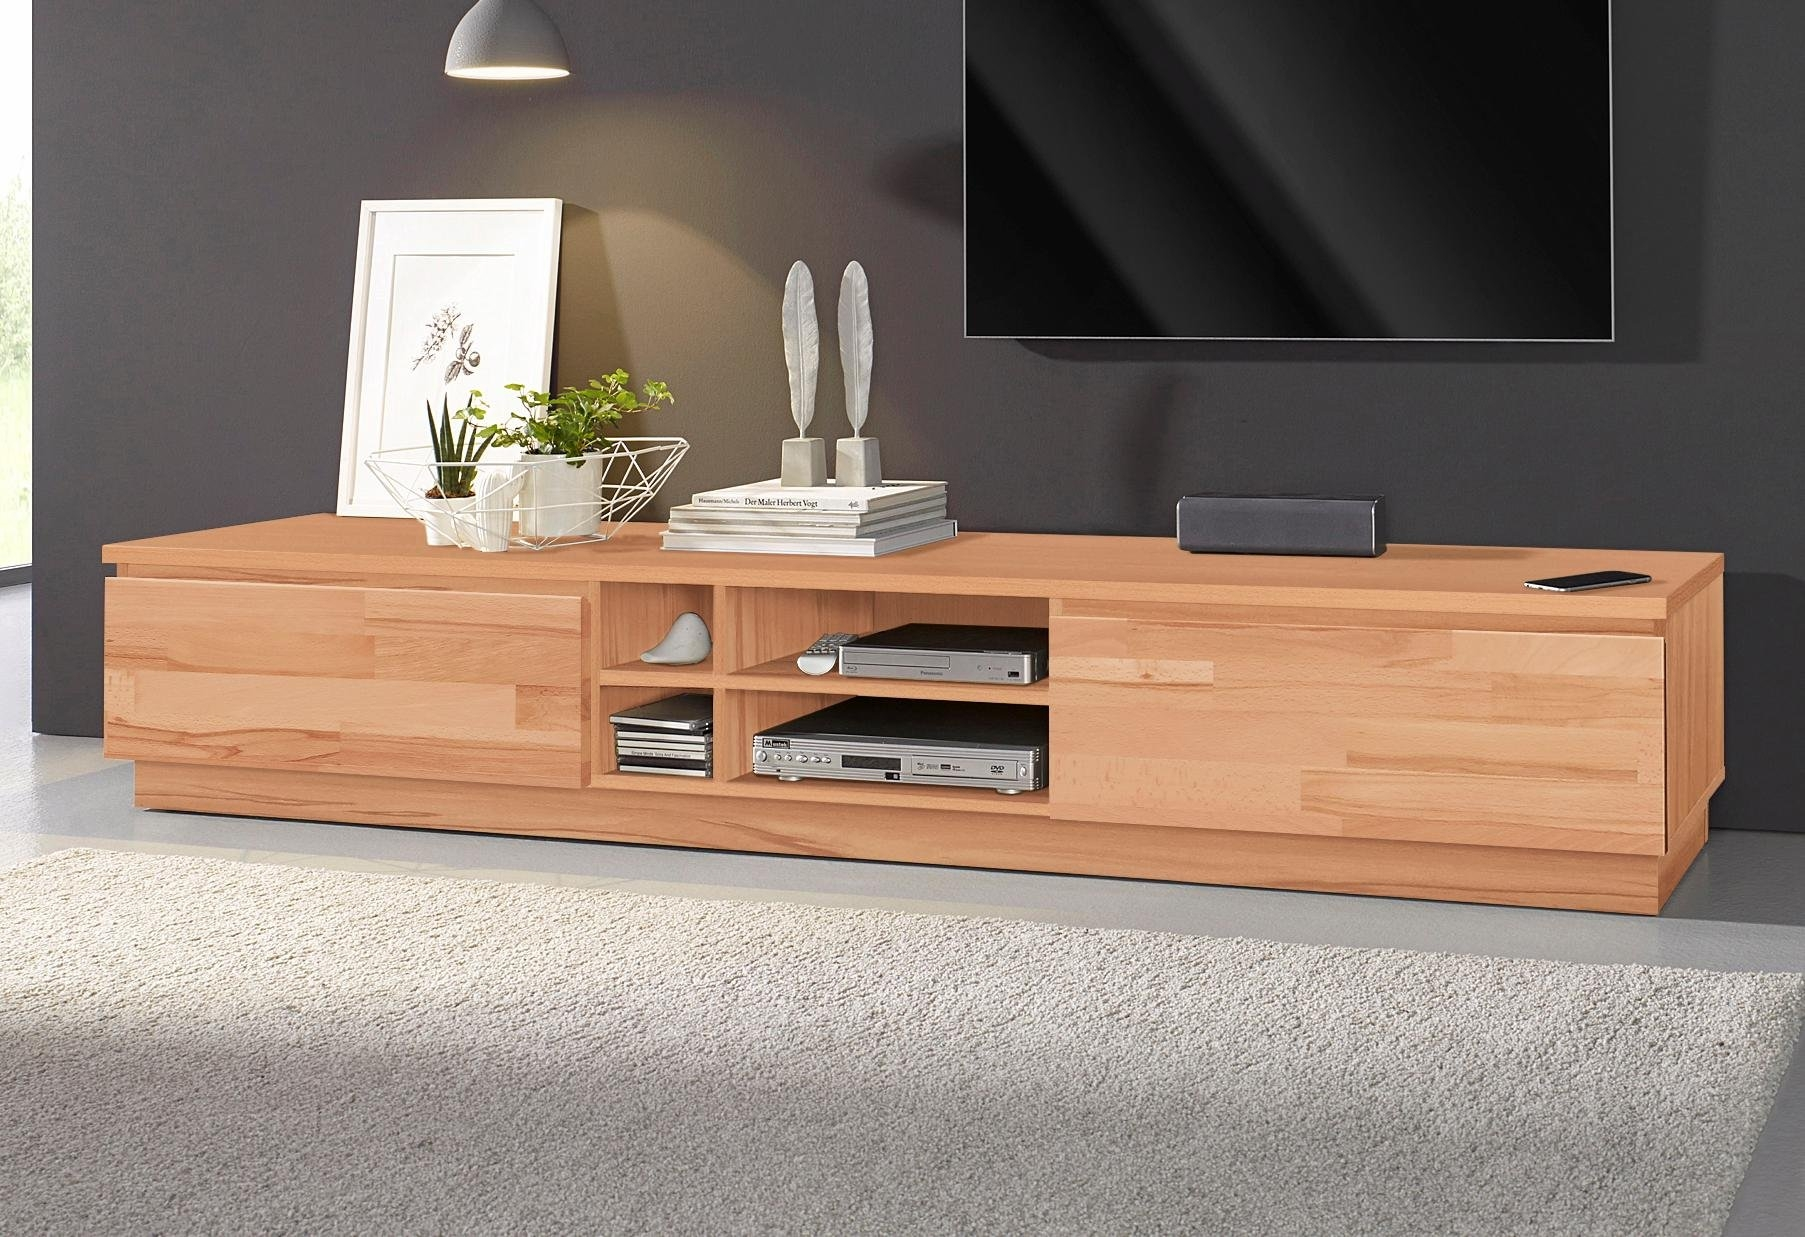 Premium collection by Home affaire tv-meubel Breedte 200 cm - gratis ruilen op otto.nl